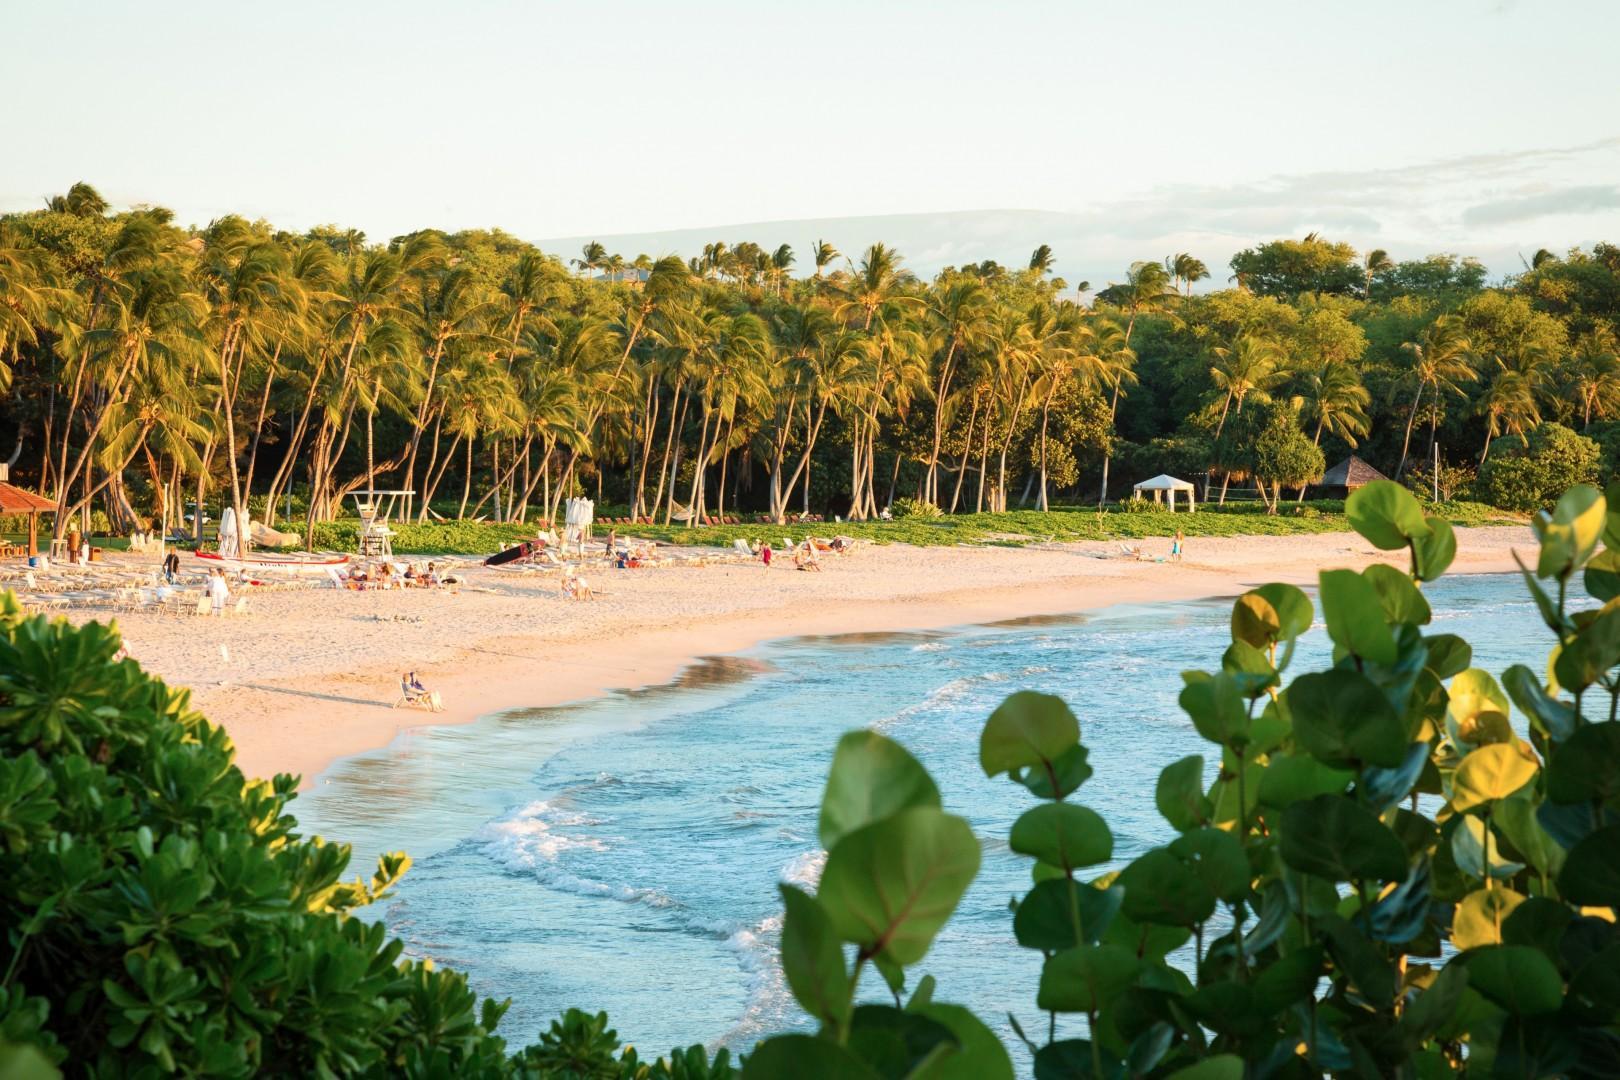 The fabulous Mauna Kea Resort Beach (Kauna'oa). Incredible white sand crescent beach - best resort beach on the island! Two-minute drive from home.